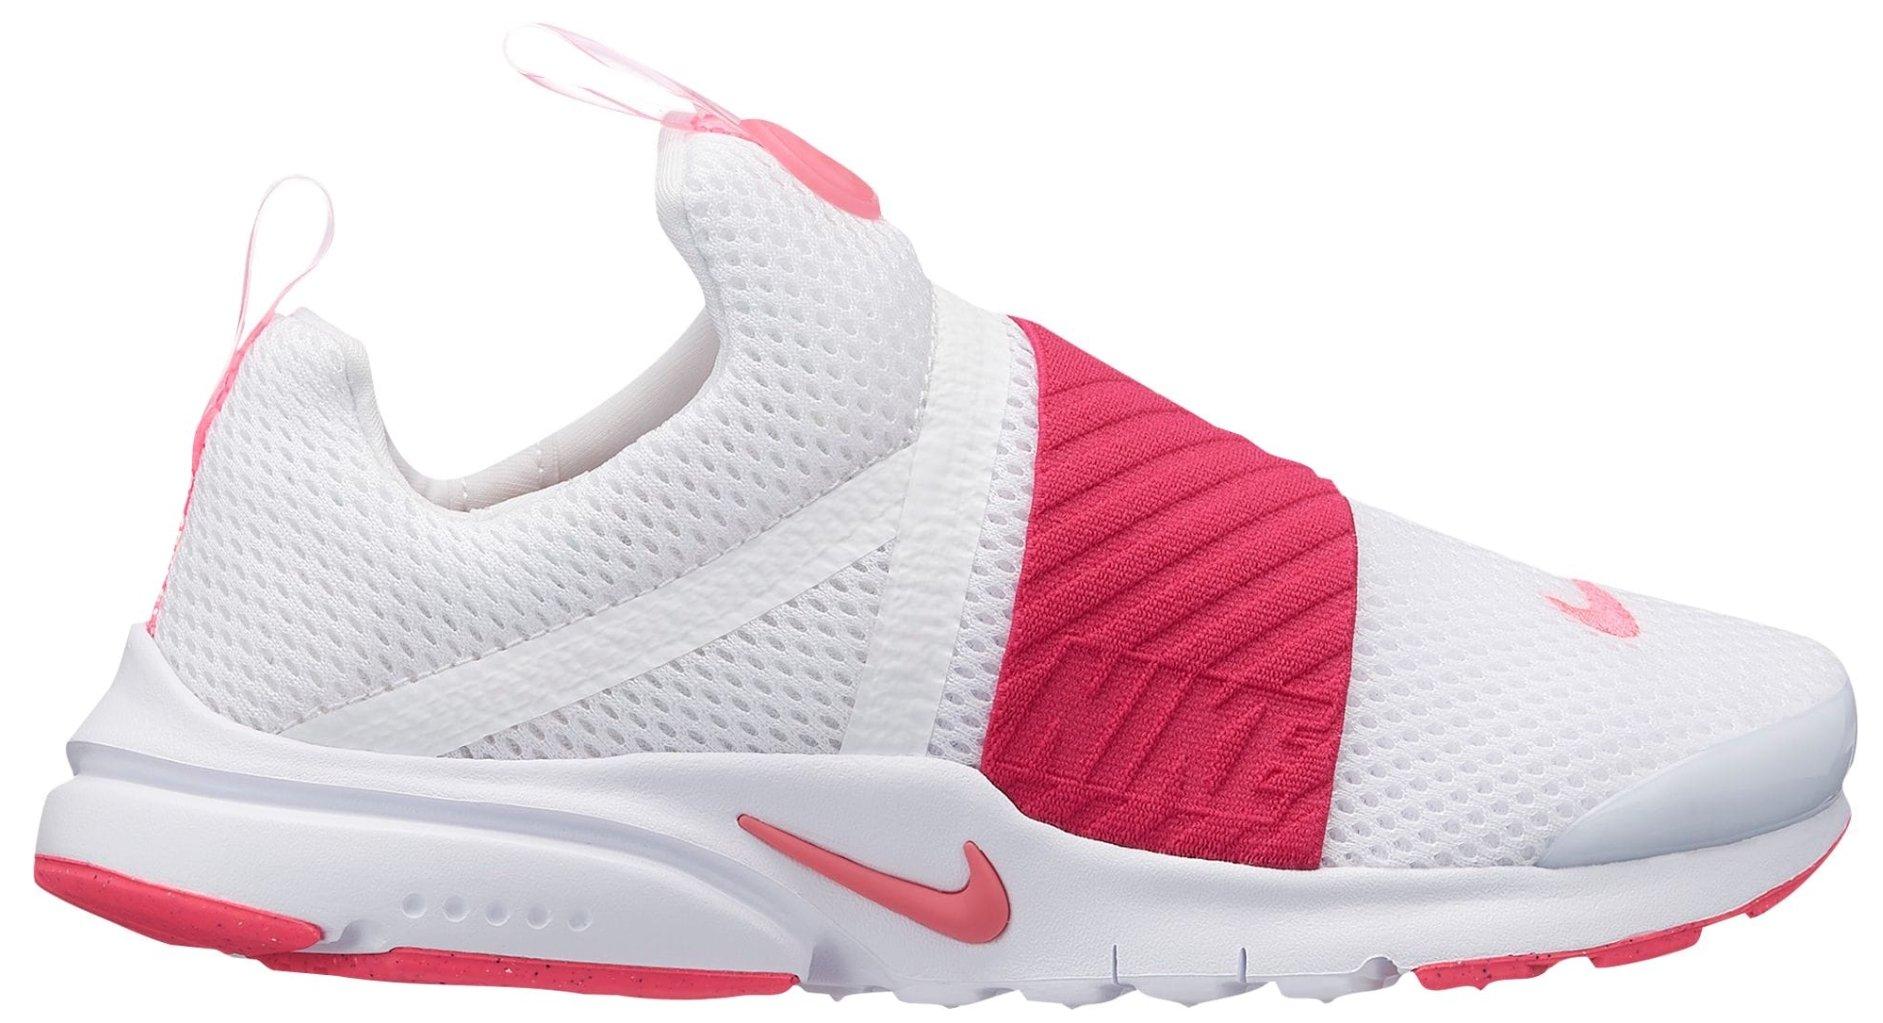 Nike Presto Extreme SE (GS) Girls' Grade School Running Shoes AA3513-100 (4Y)